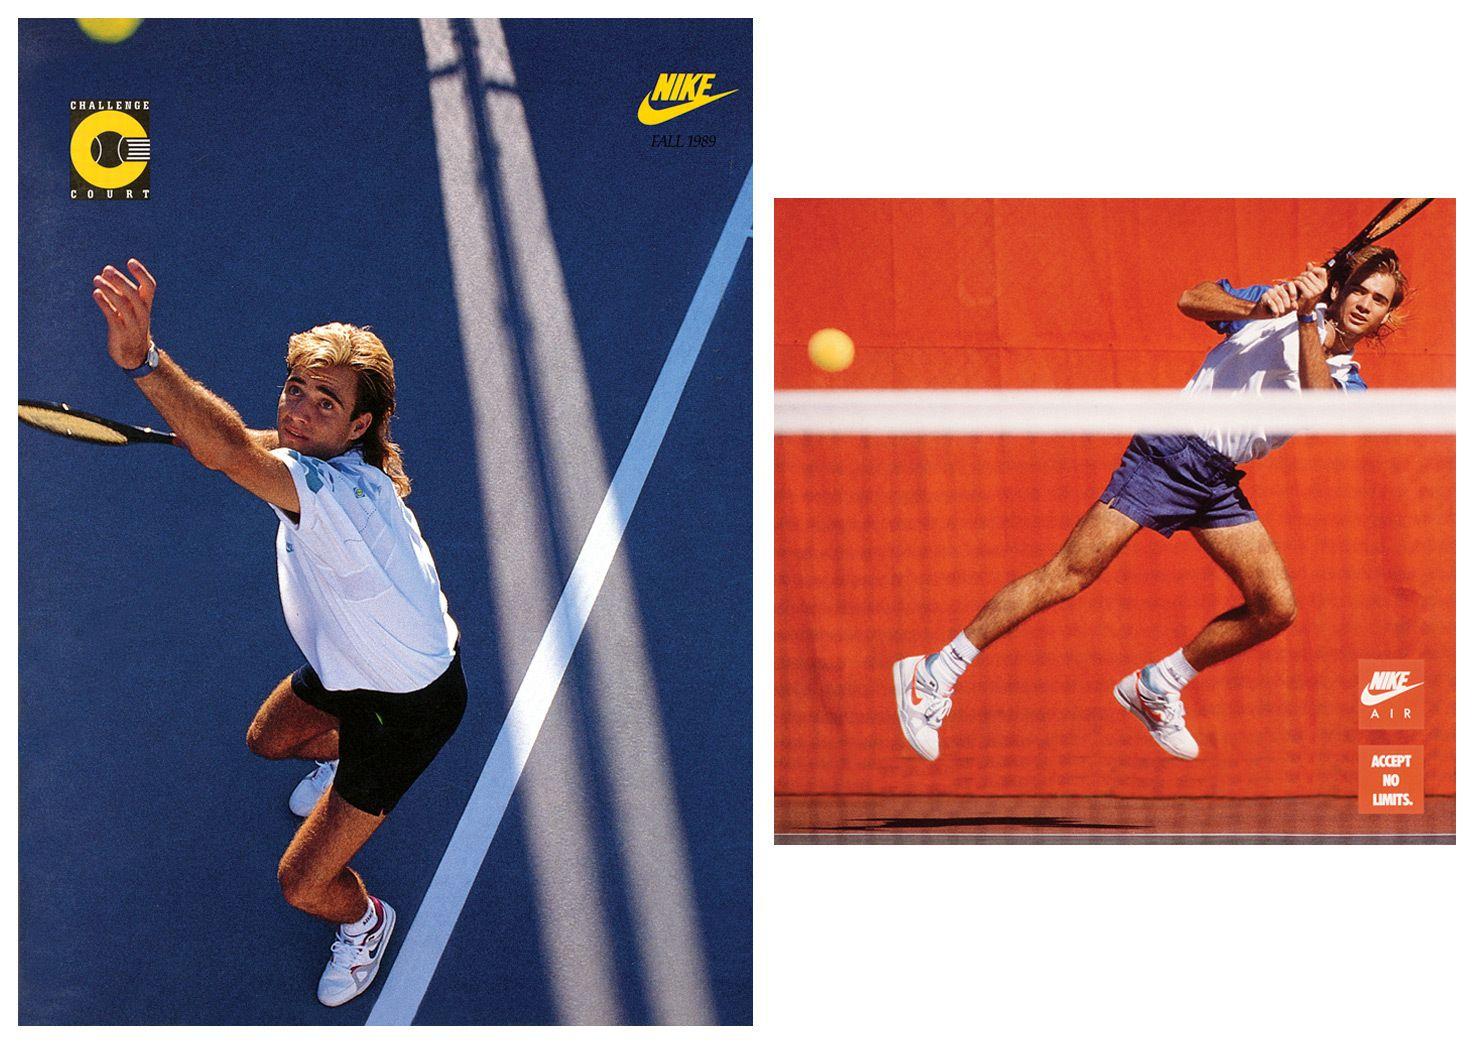 Old Nike Tennis Vintage Advert Posters Google Search